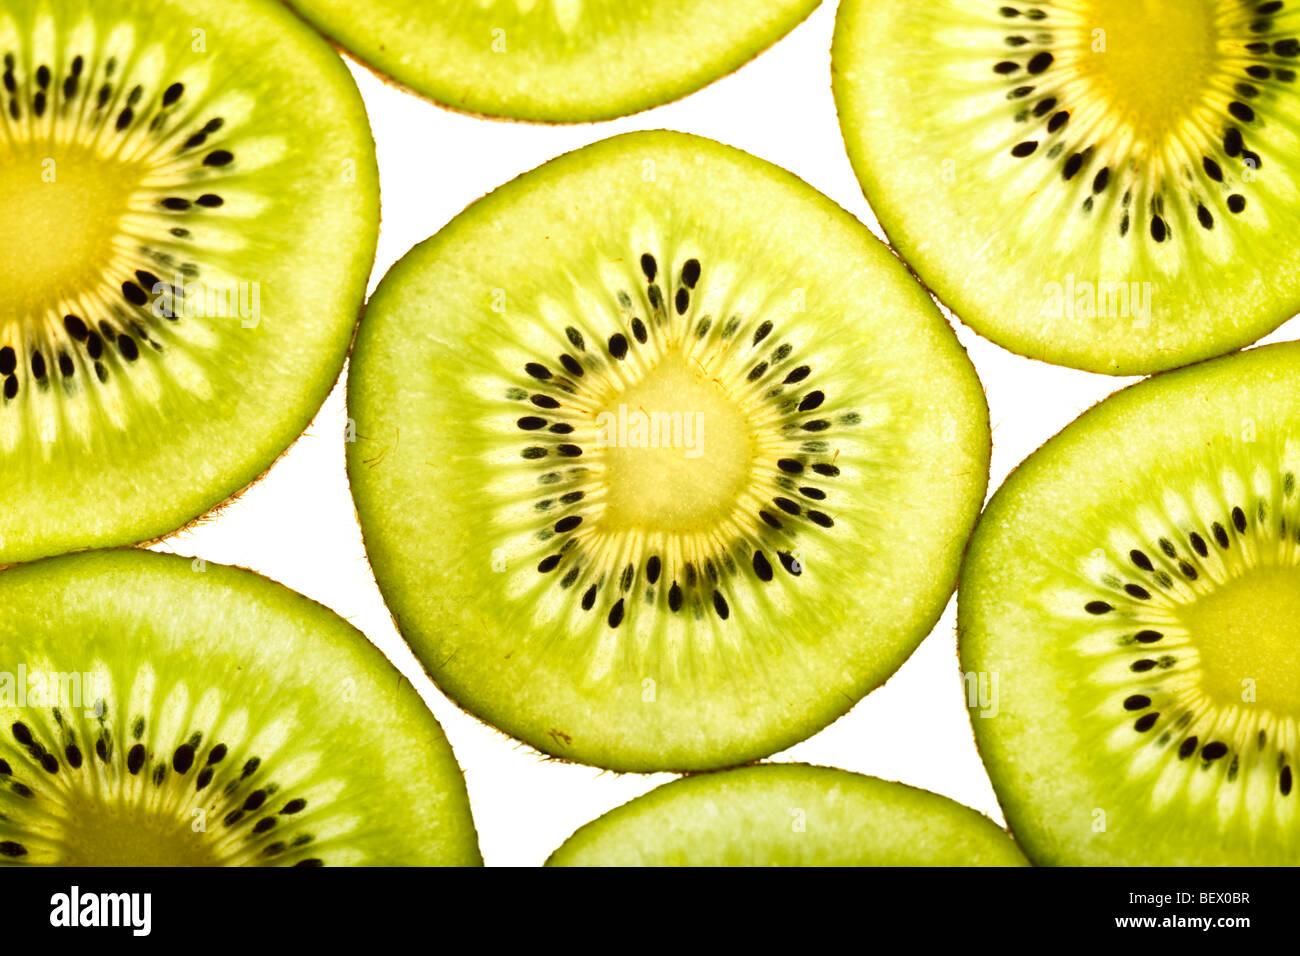 Freshly cut kiwi - Stock Image